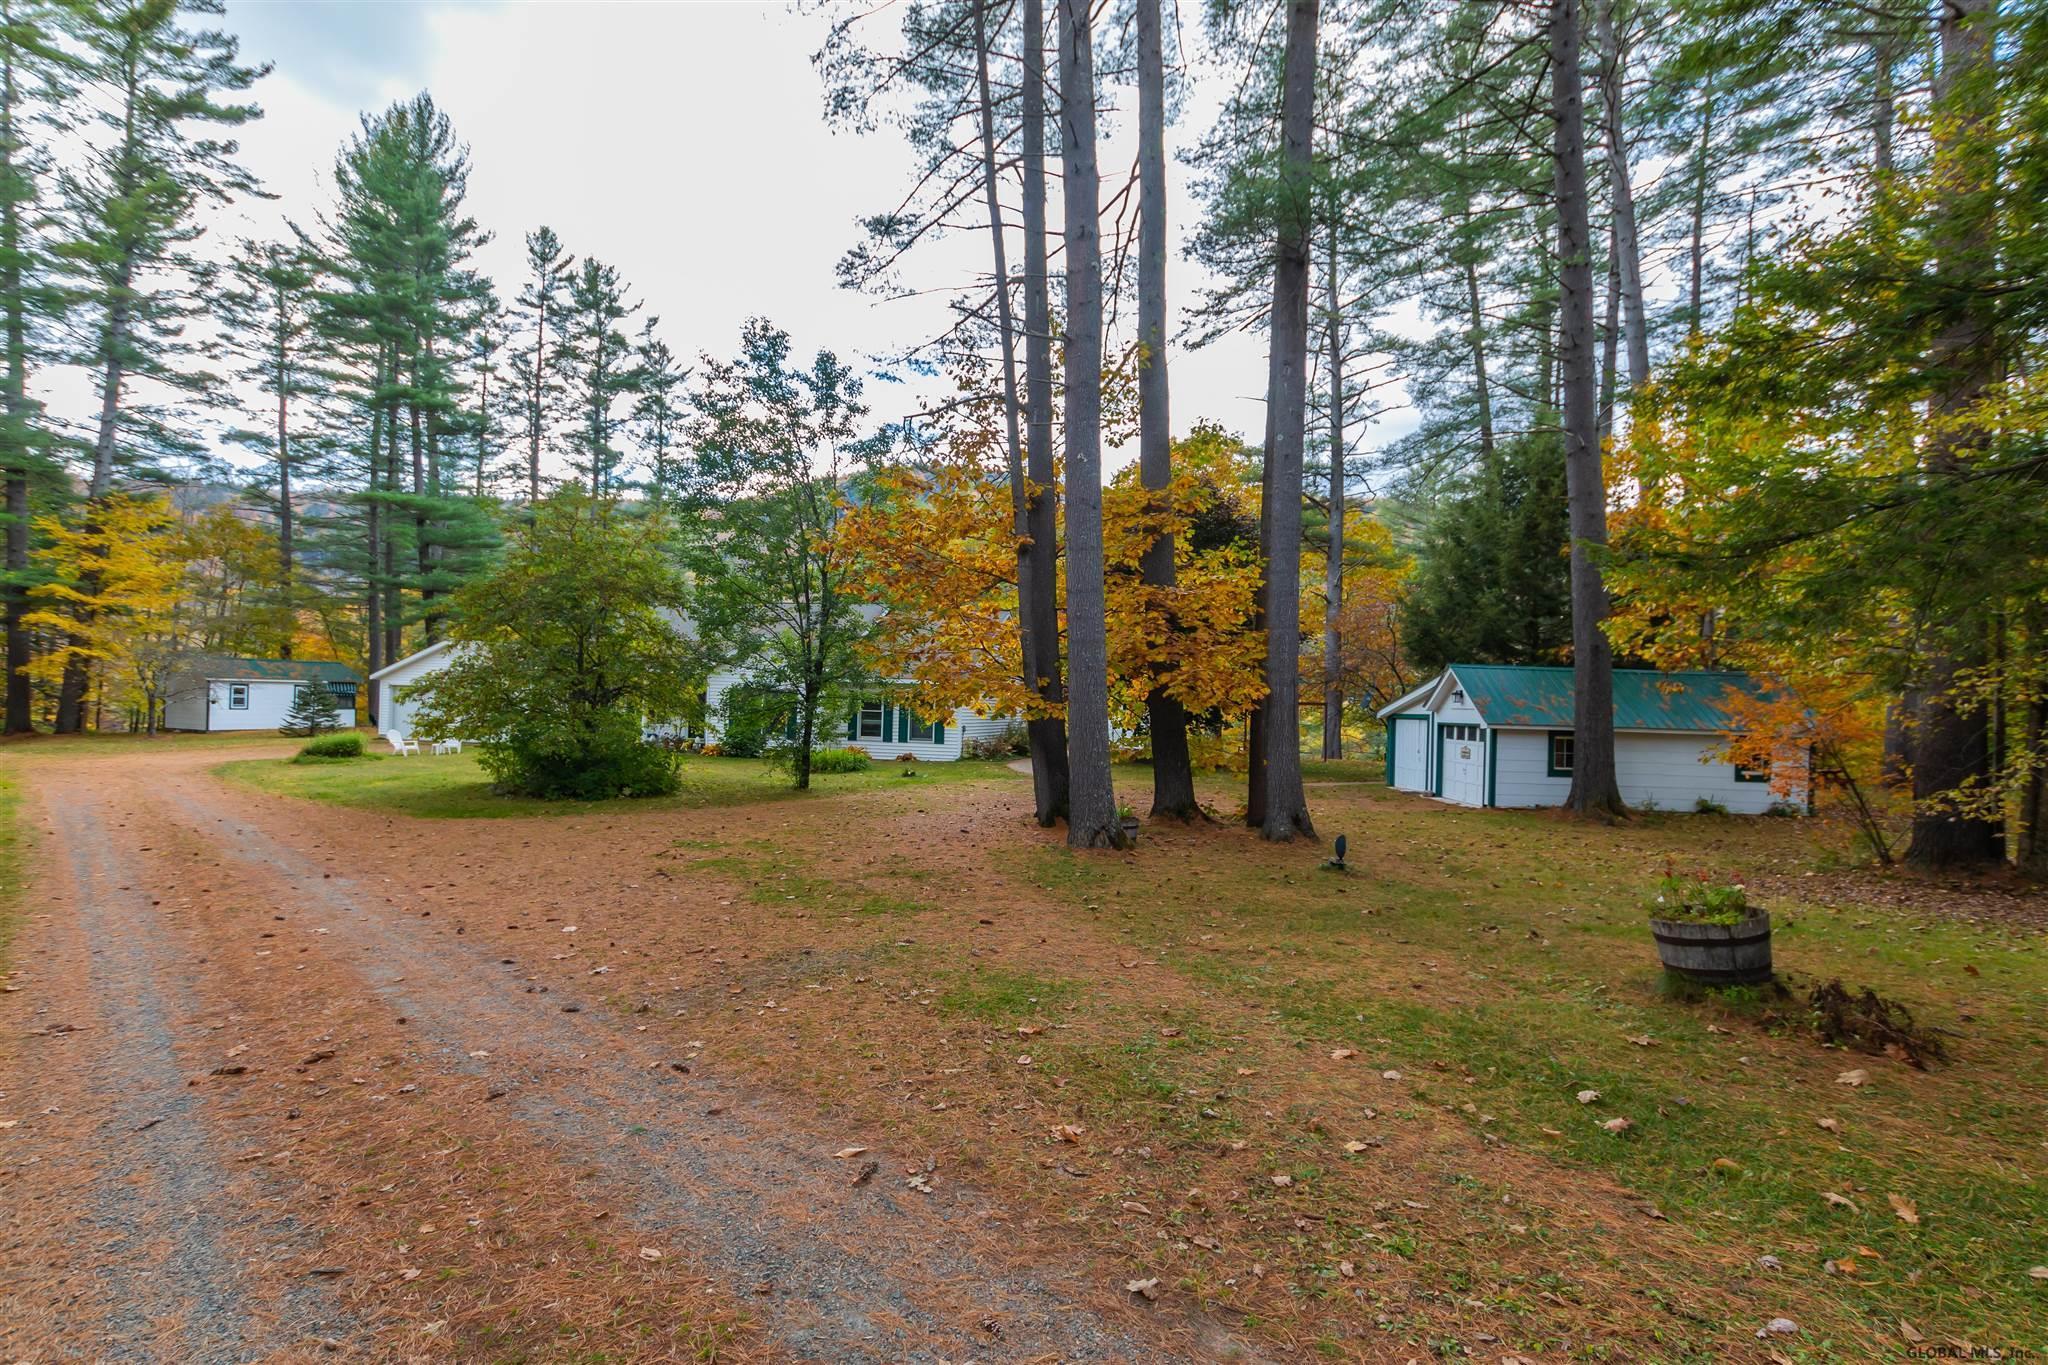 Northville image 69